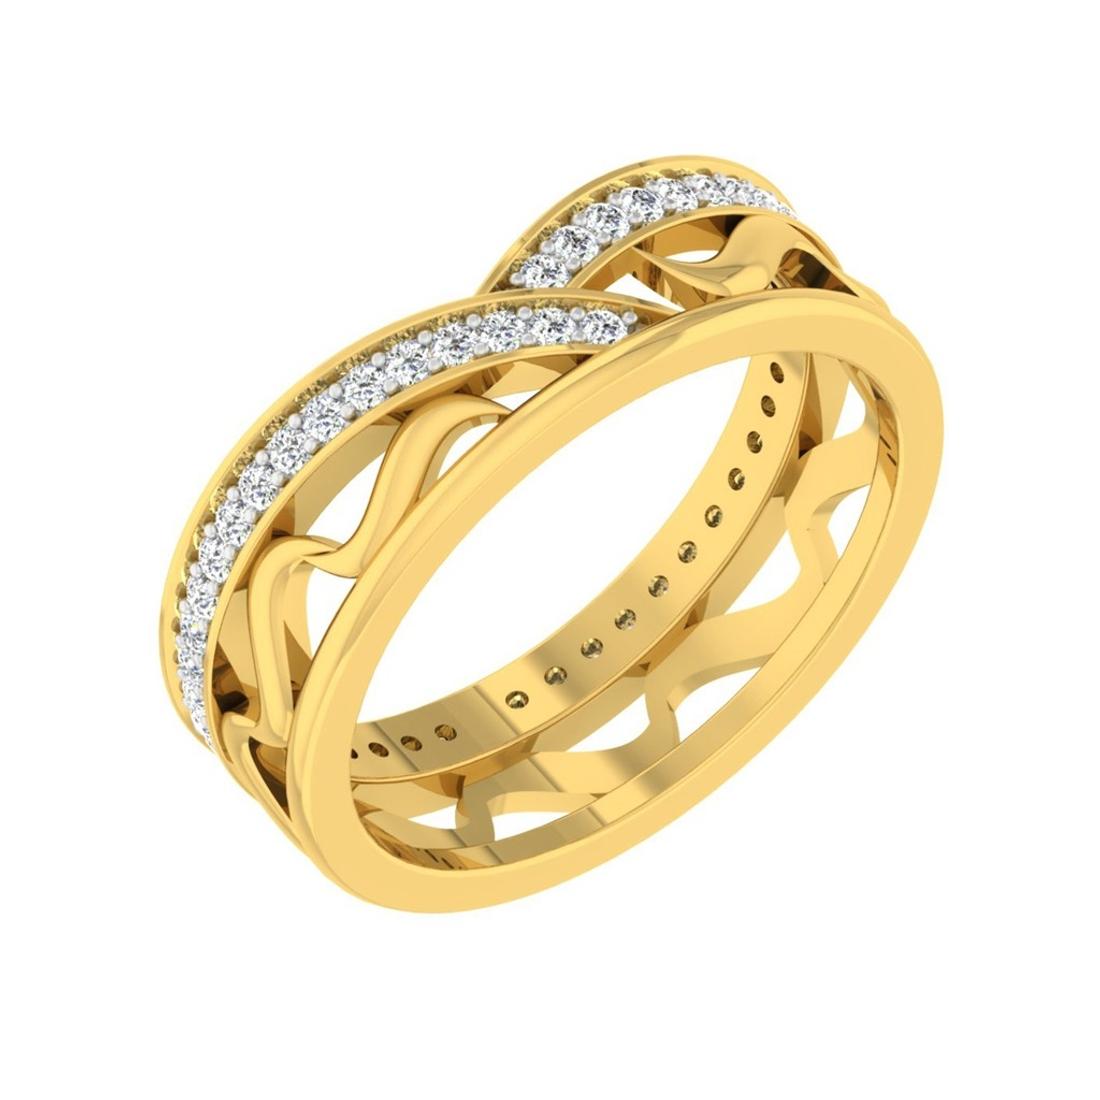 Sarvada Jewels' The Nova Wave Ring